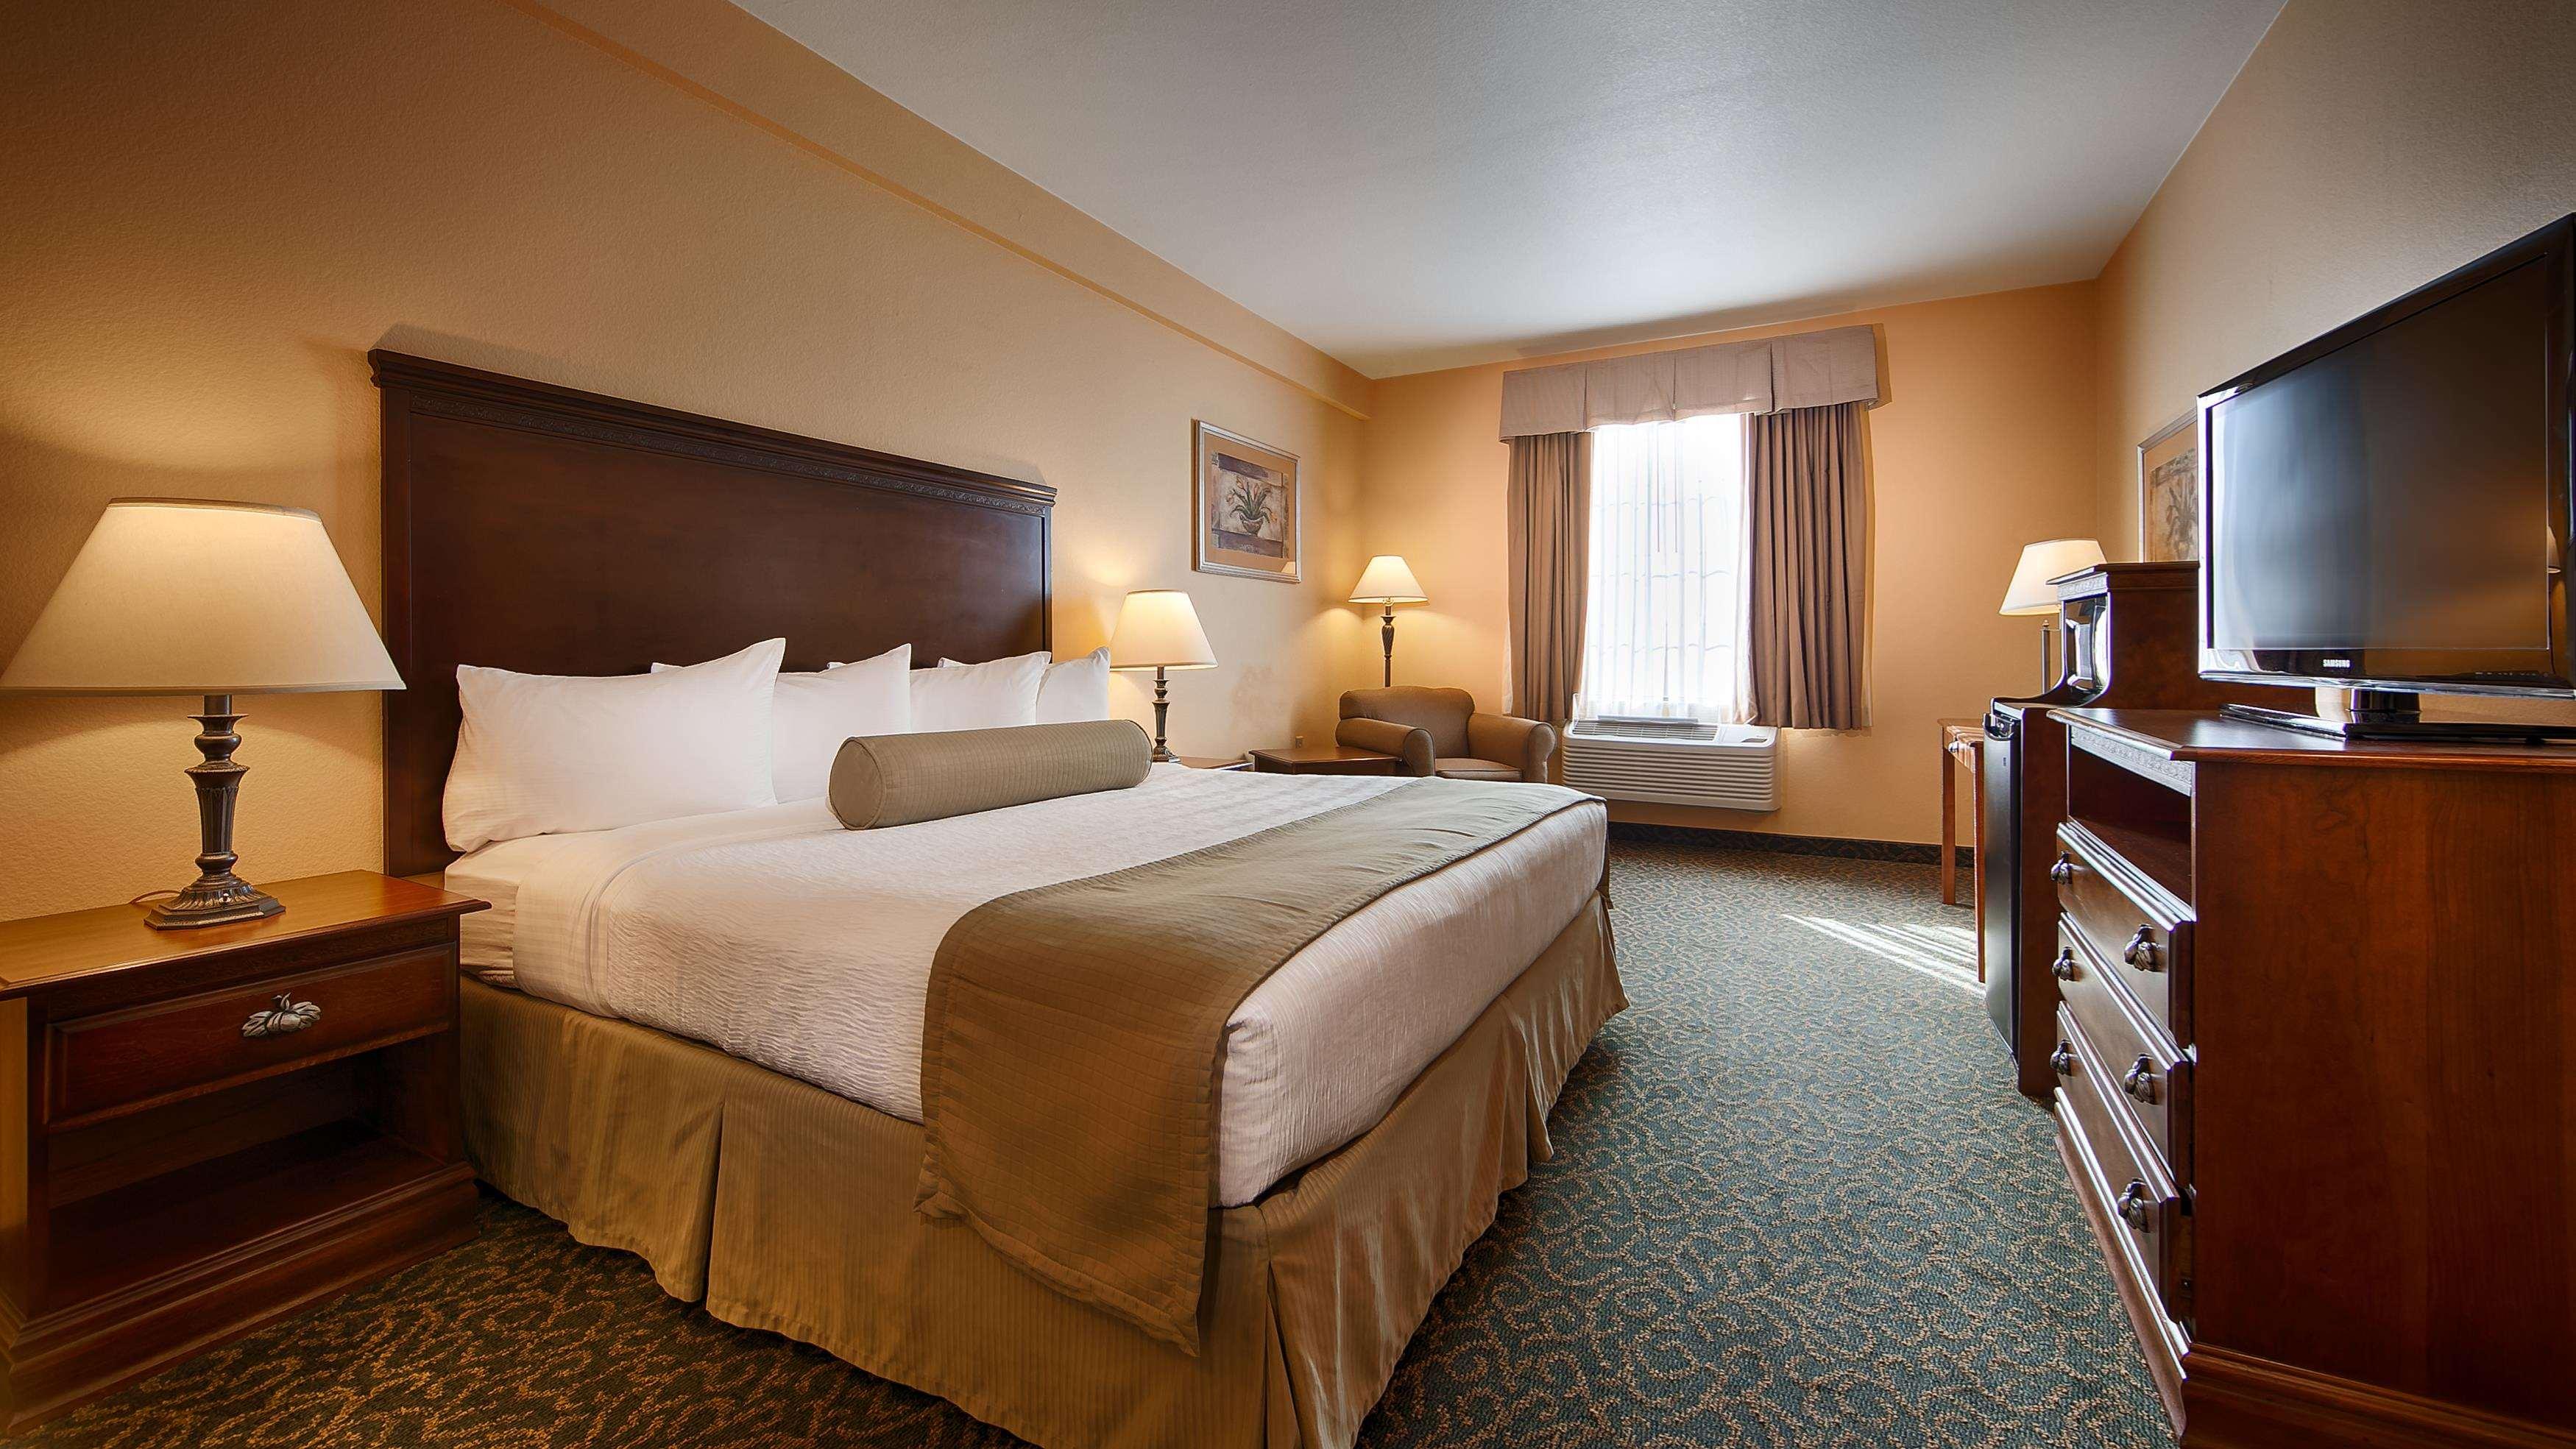 Best Western Plus Executive Hotel & Suites image 14